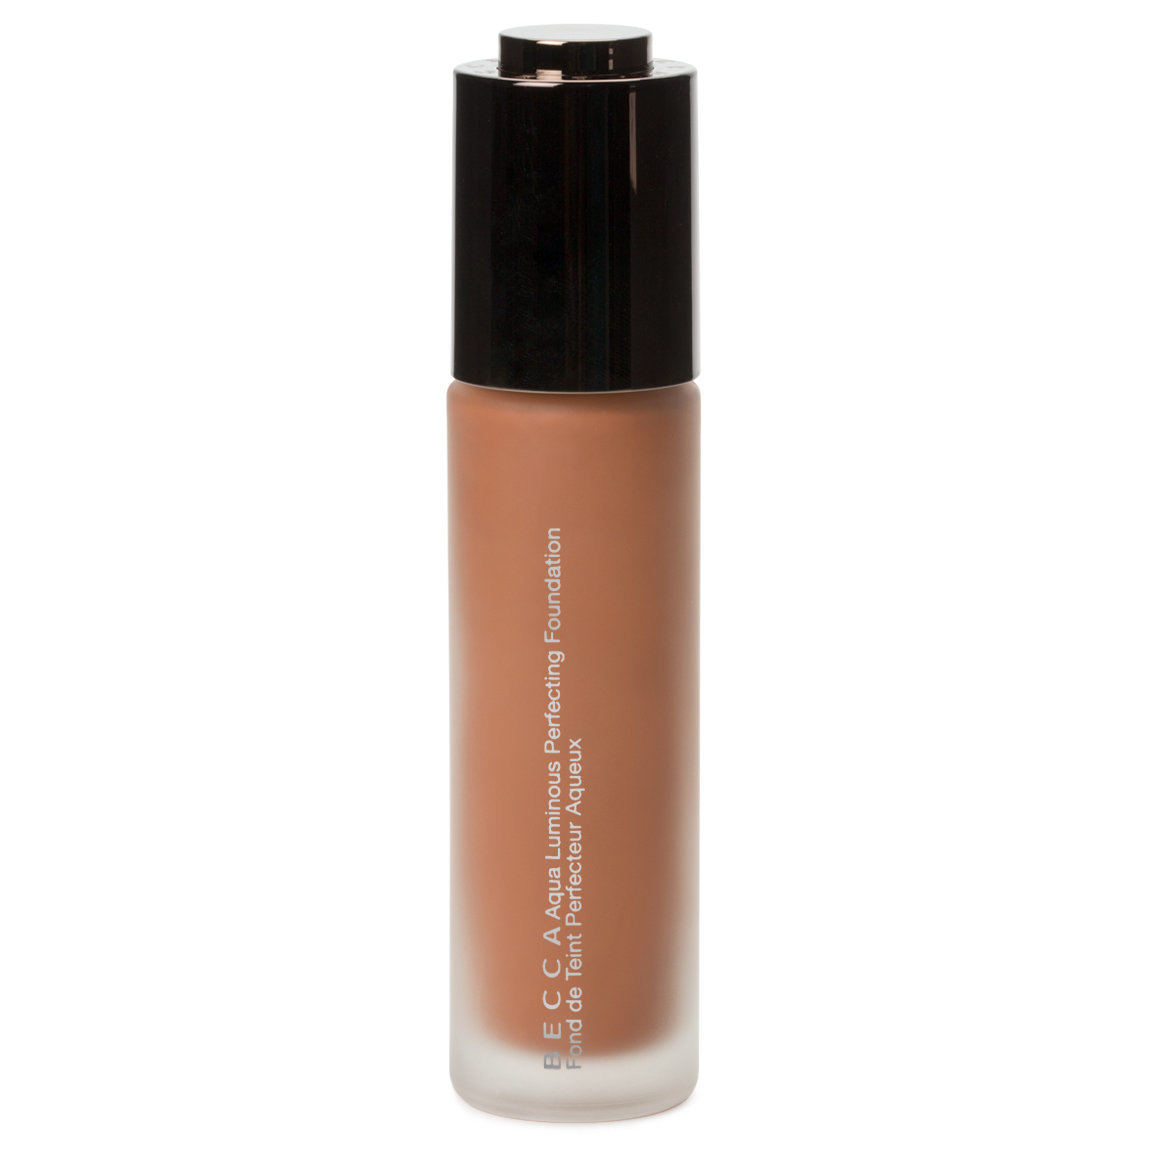 BECCA Cosmetics Aqua Luminous Perfecting Foundation Deep Bronze alternative view 1.